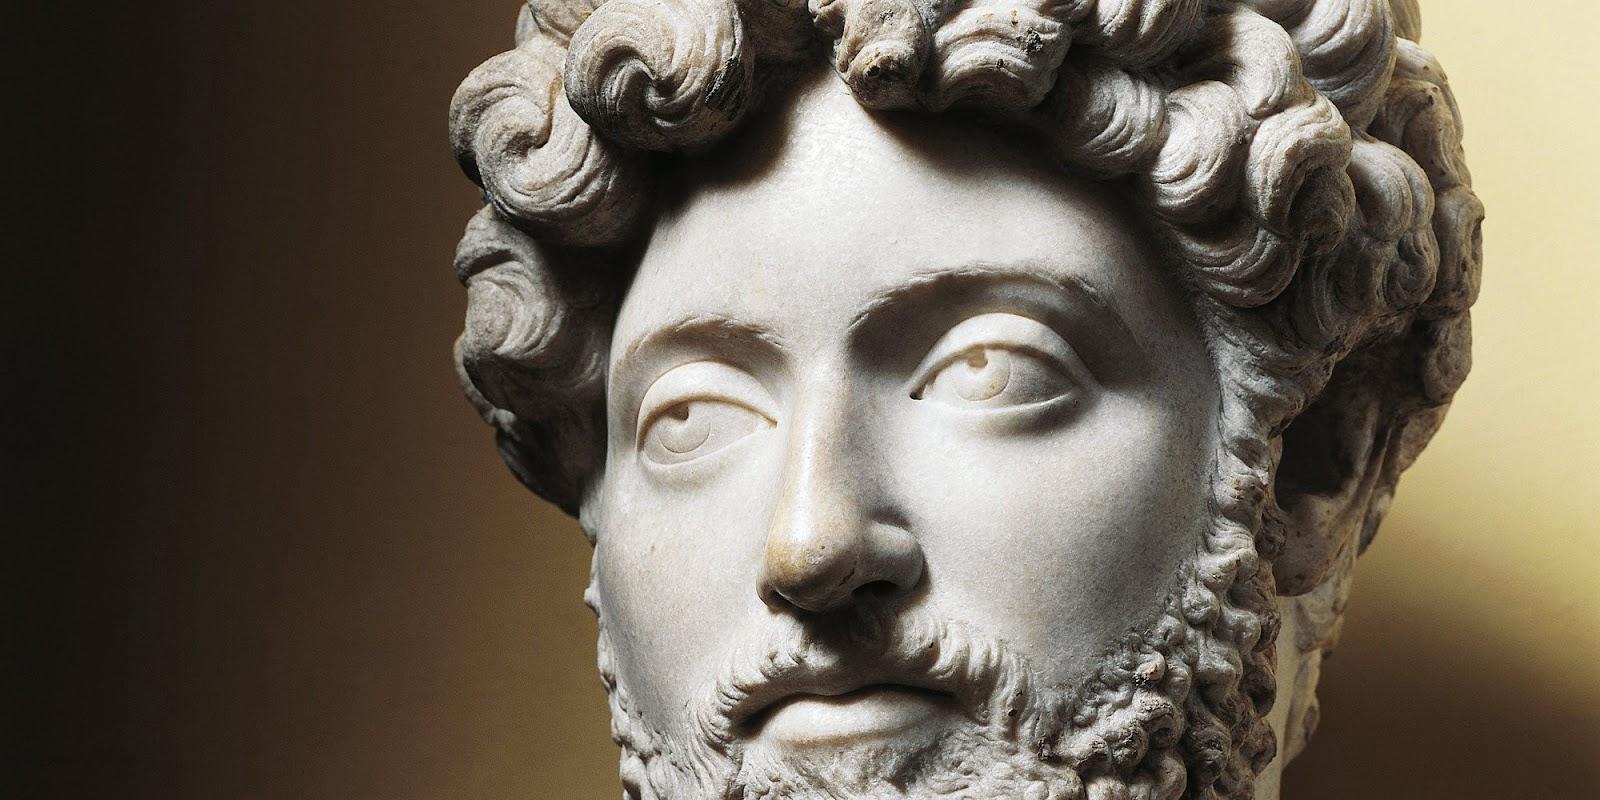 Marcus Aurelius nighttime routine (5 Reasons to try)